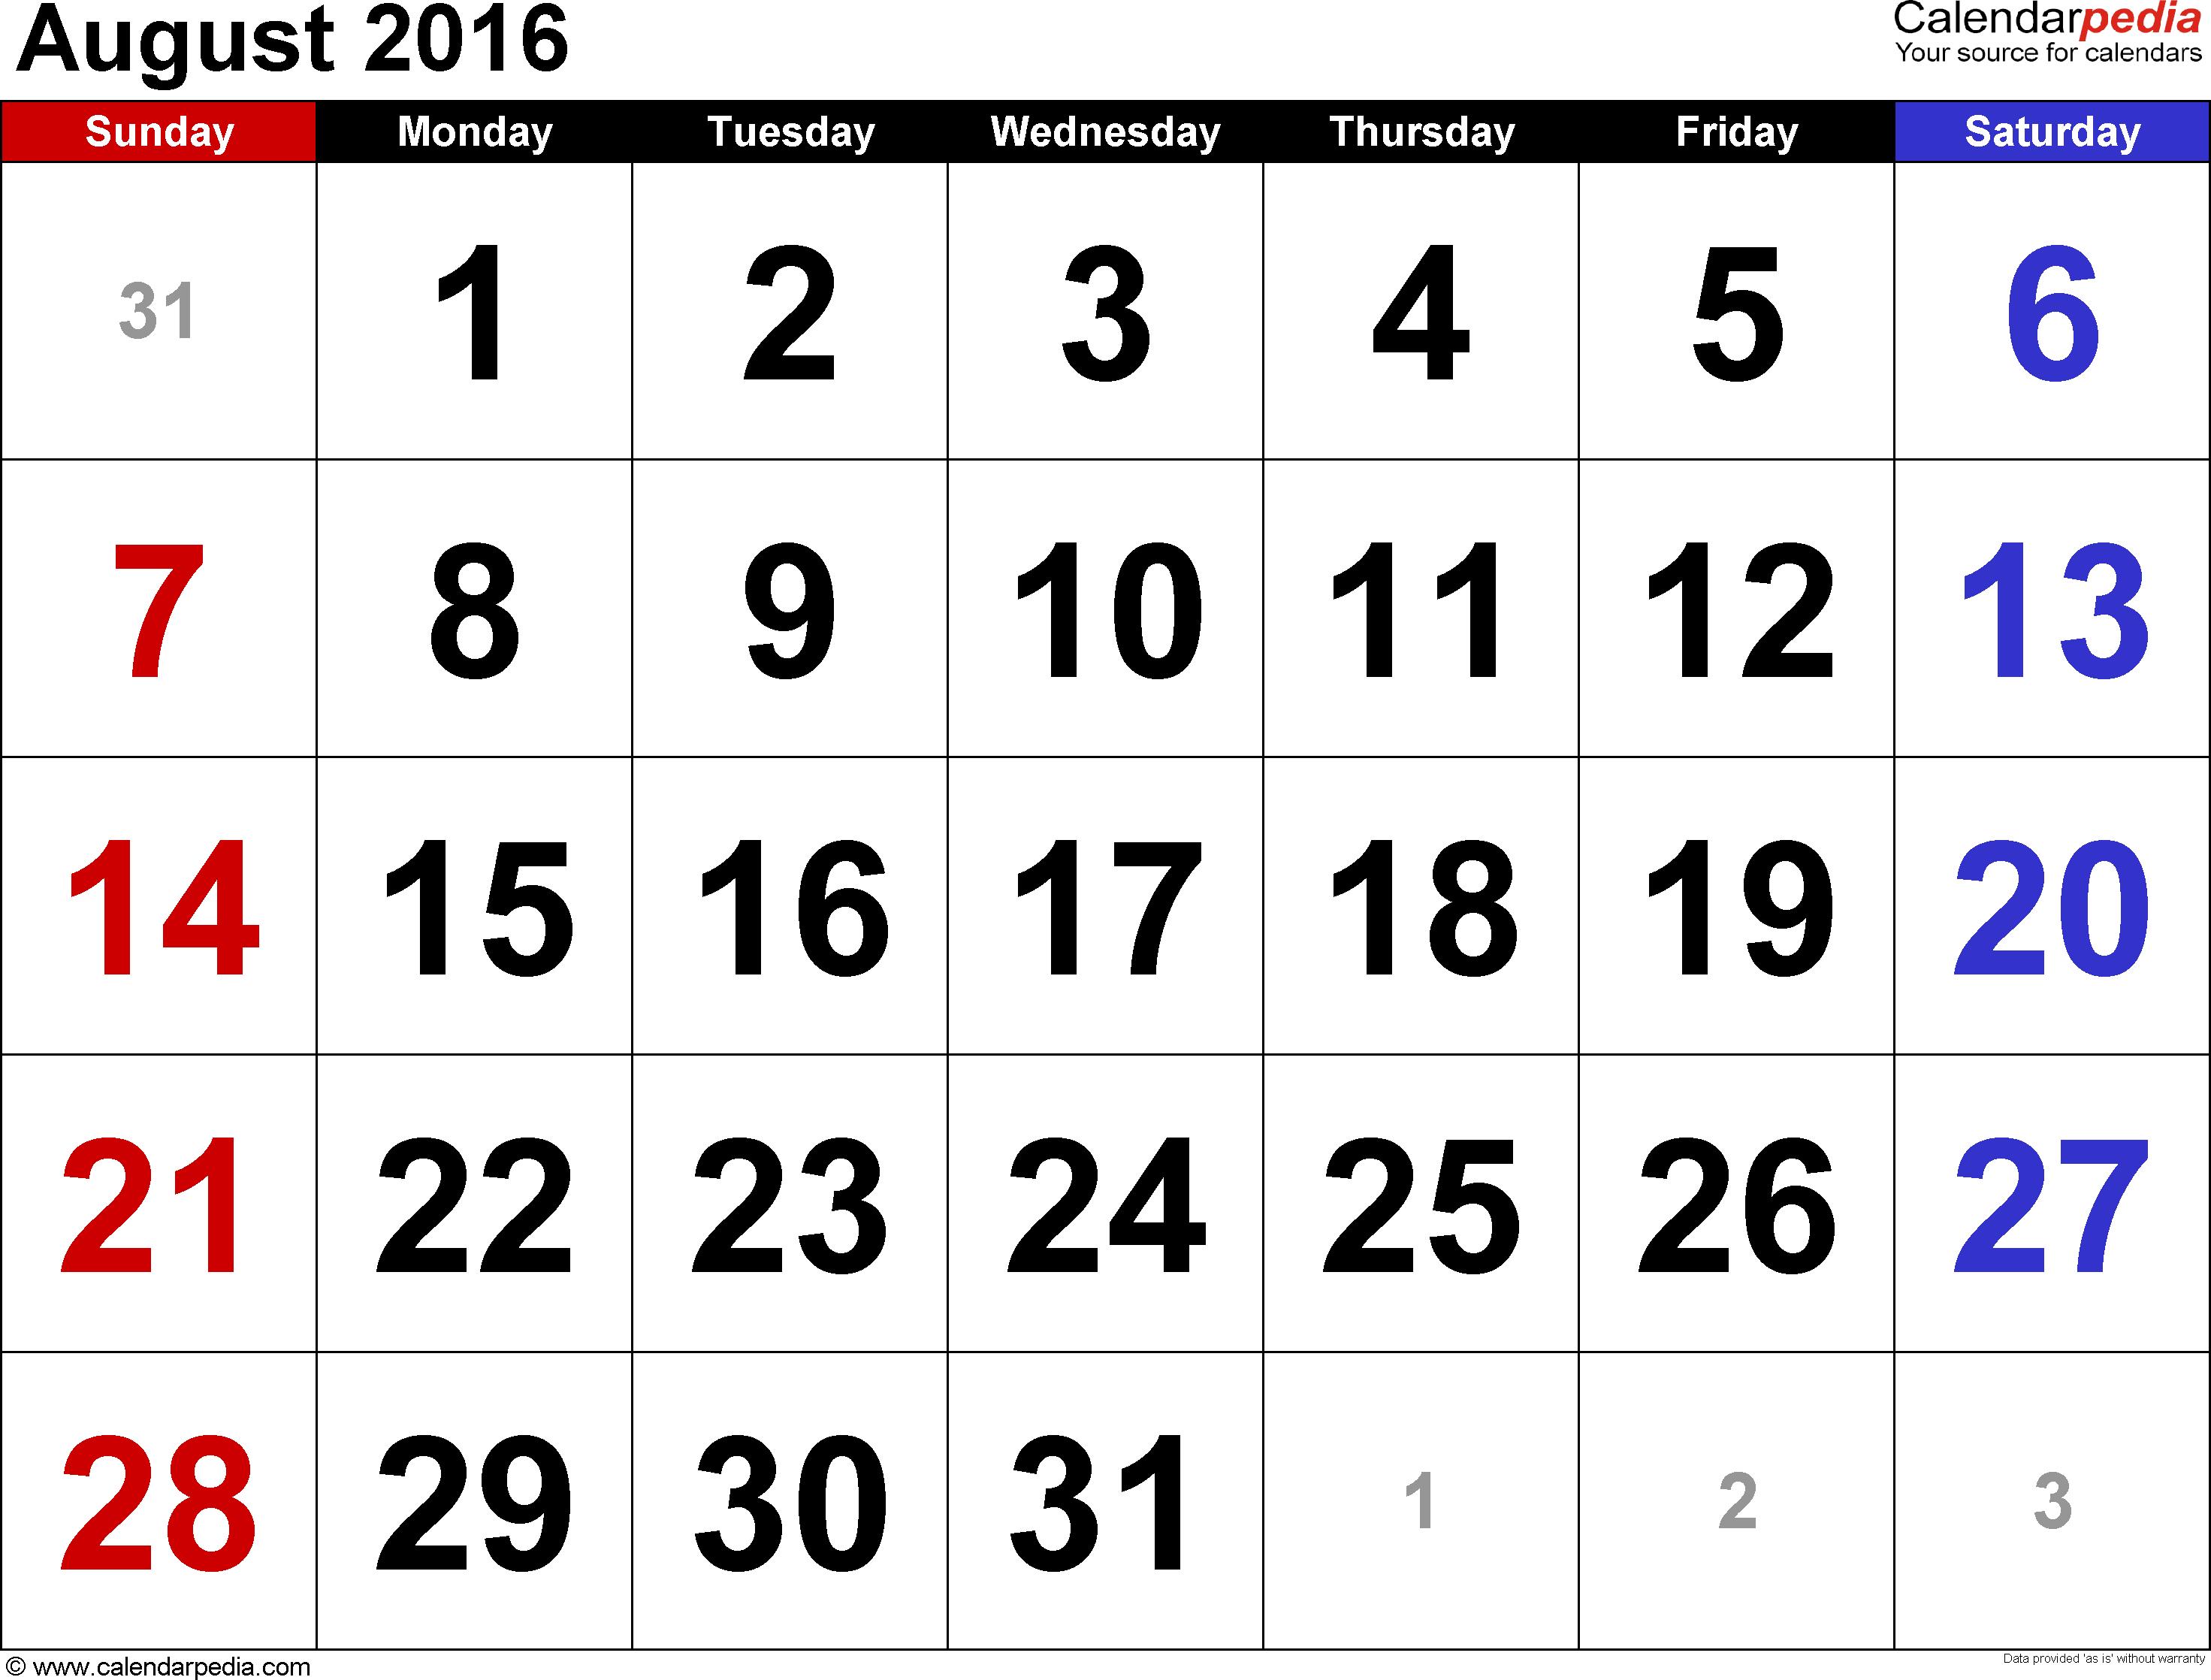 august 2016 printable calendar blank templates printable calendar templates. Black Bedroom Furniture Sets. Home Design Ideas